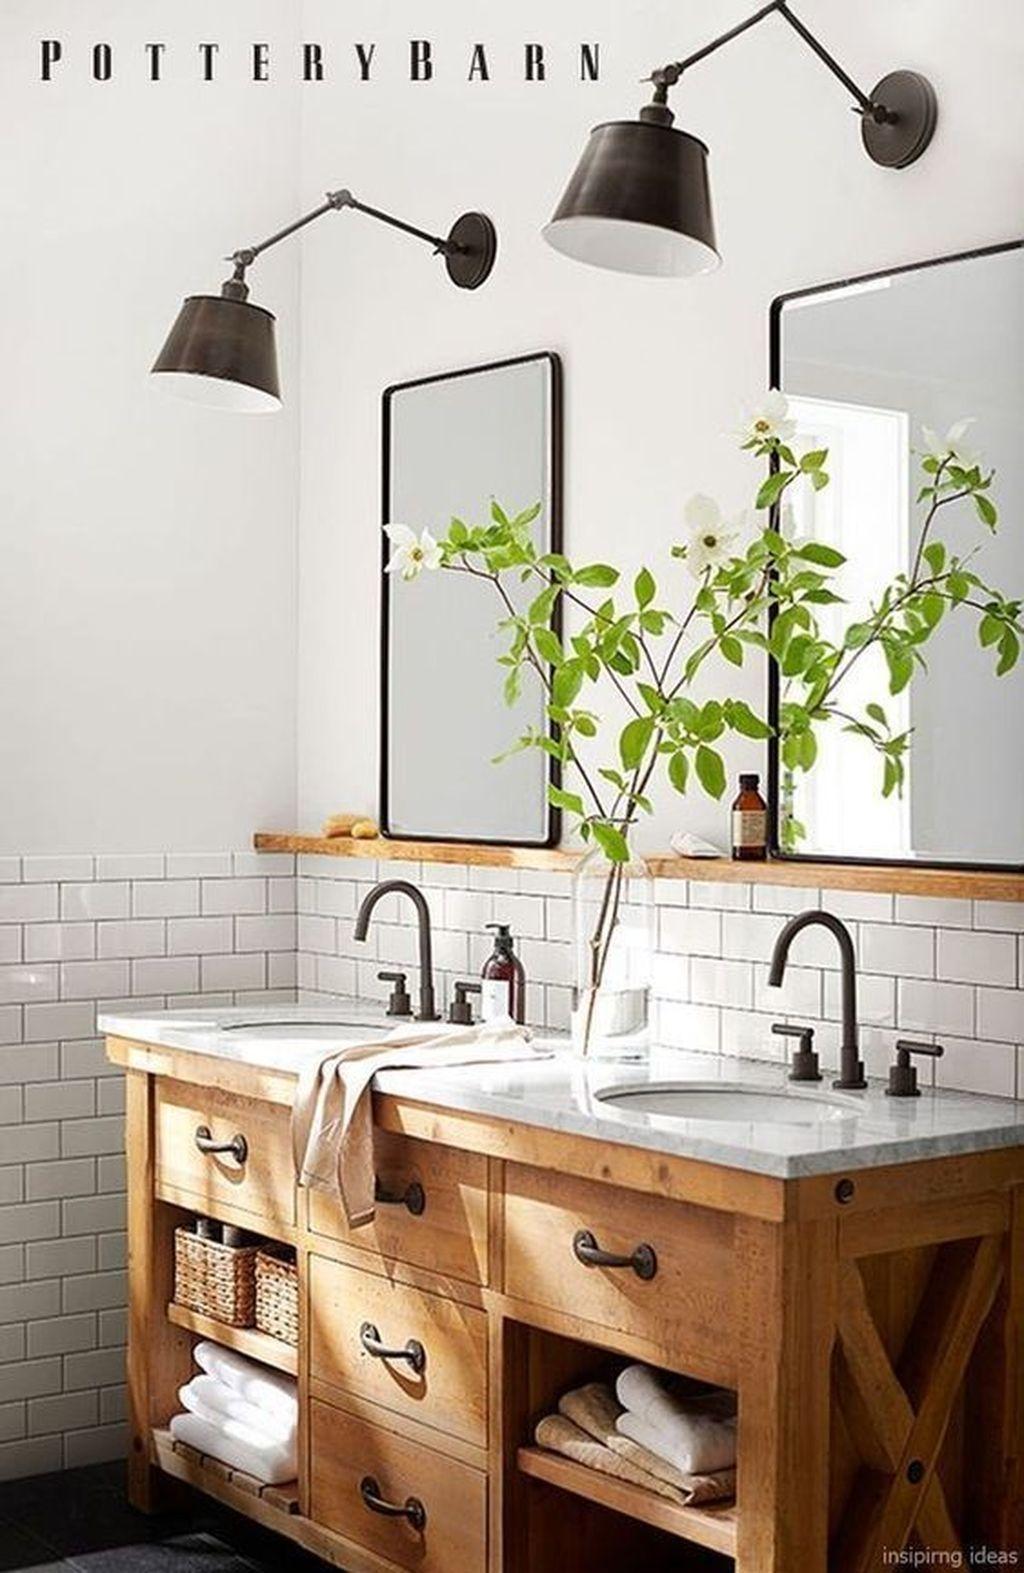 37 Fantastic Farmhouse Bathroom Vanity Ideas images